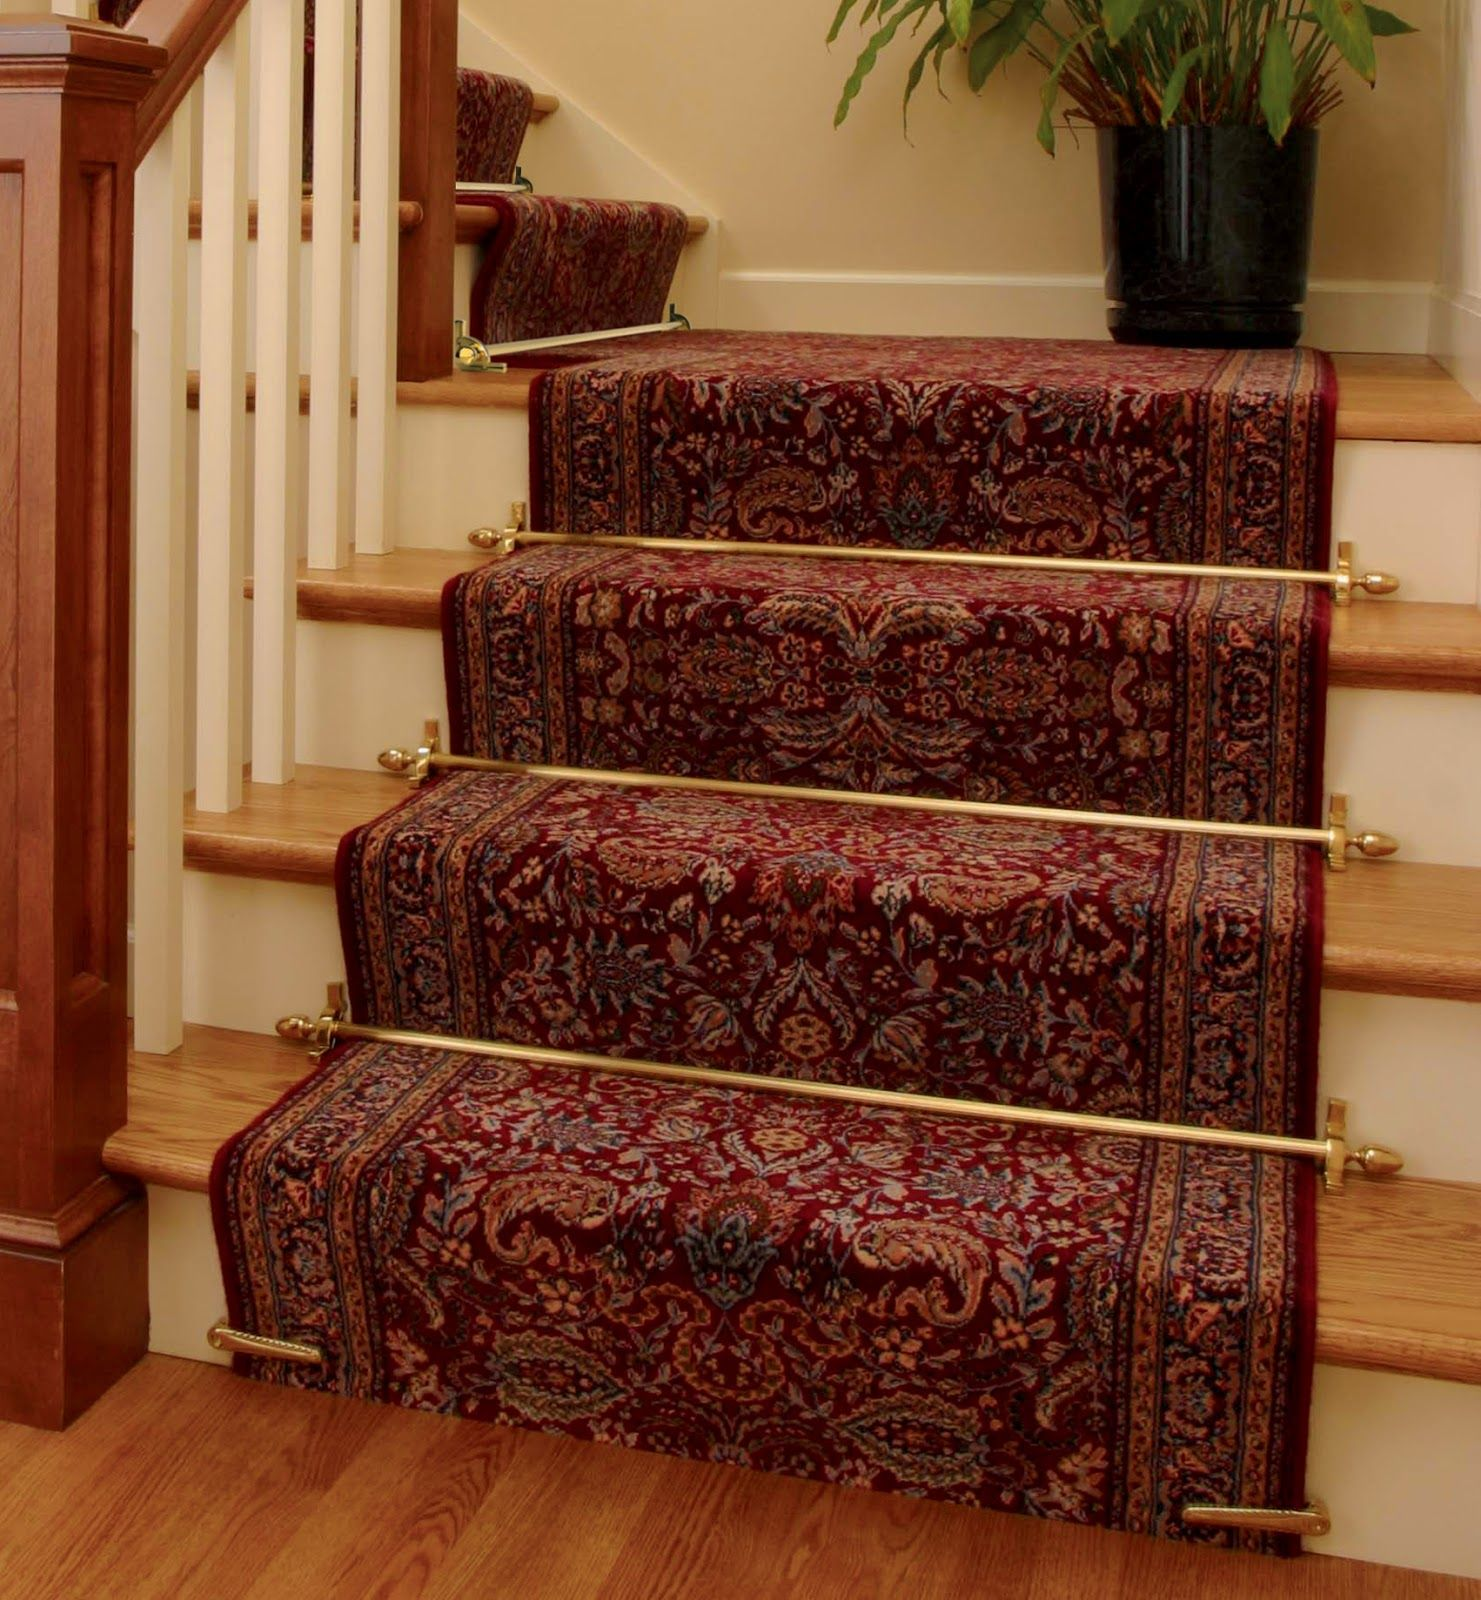 Best Oriental Rug Runners For Stairs Stair Runner Carpet 400 x 300